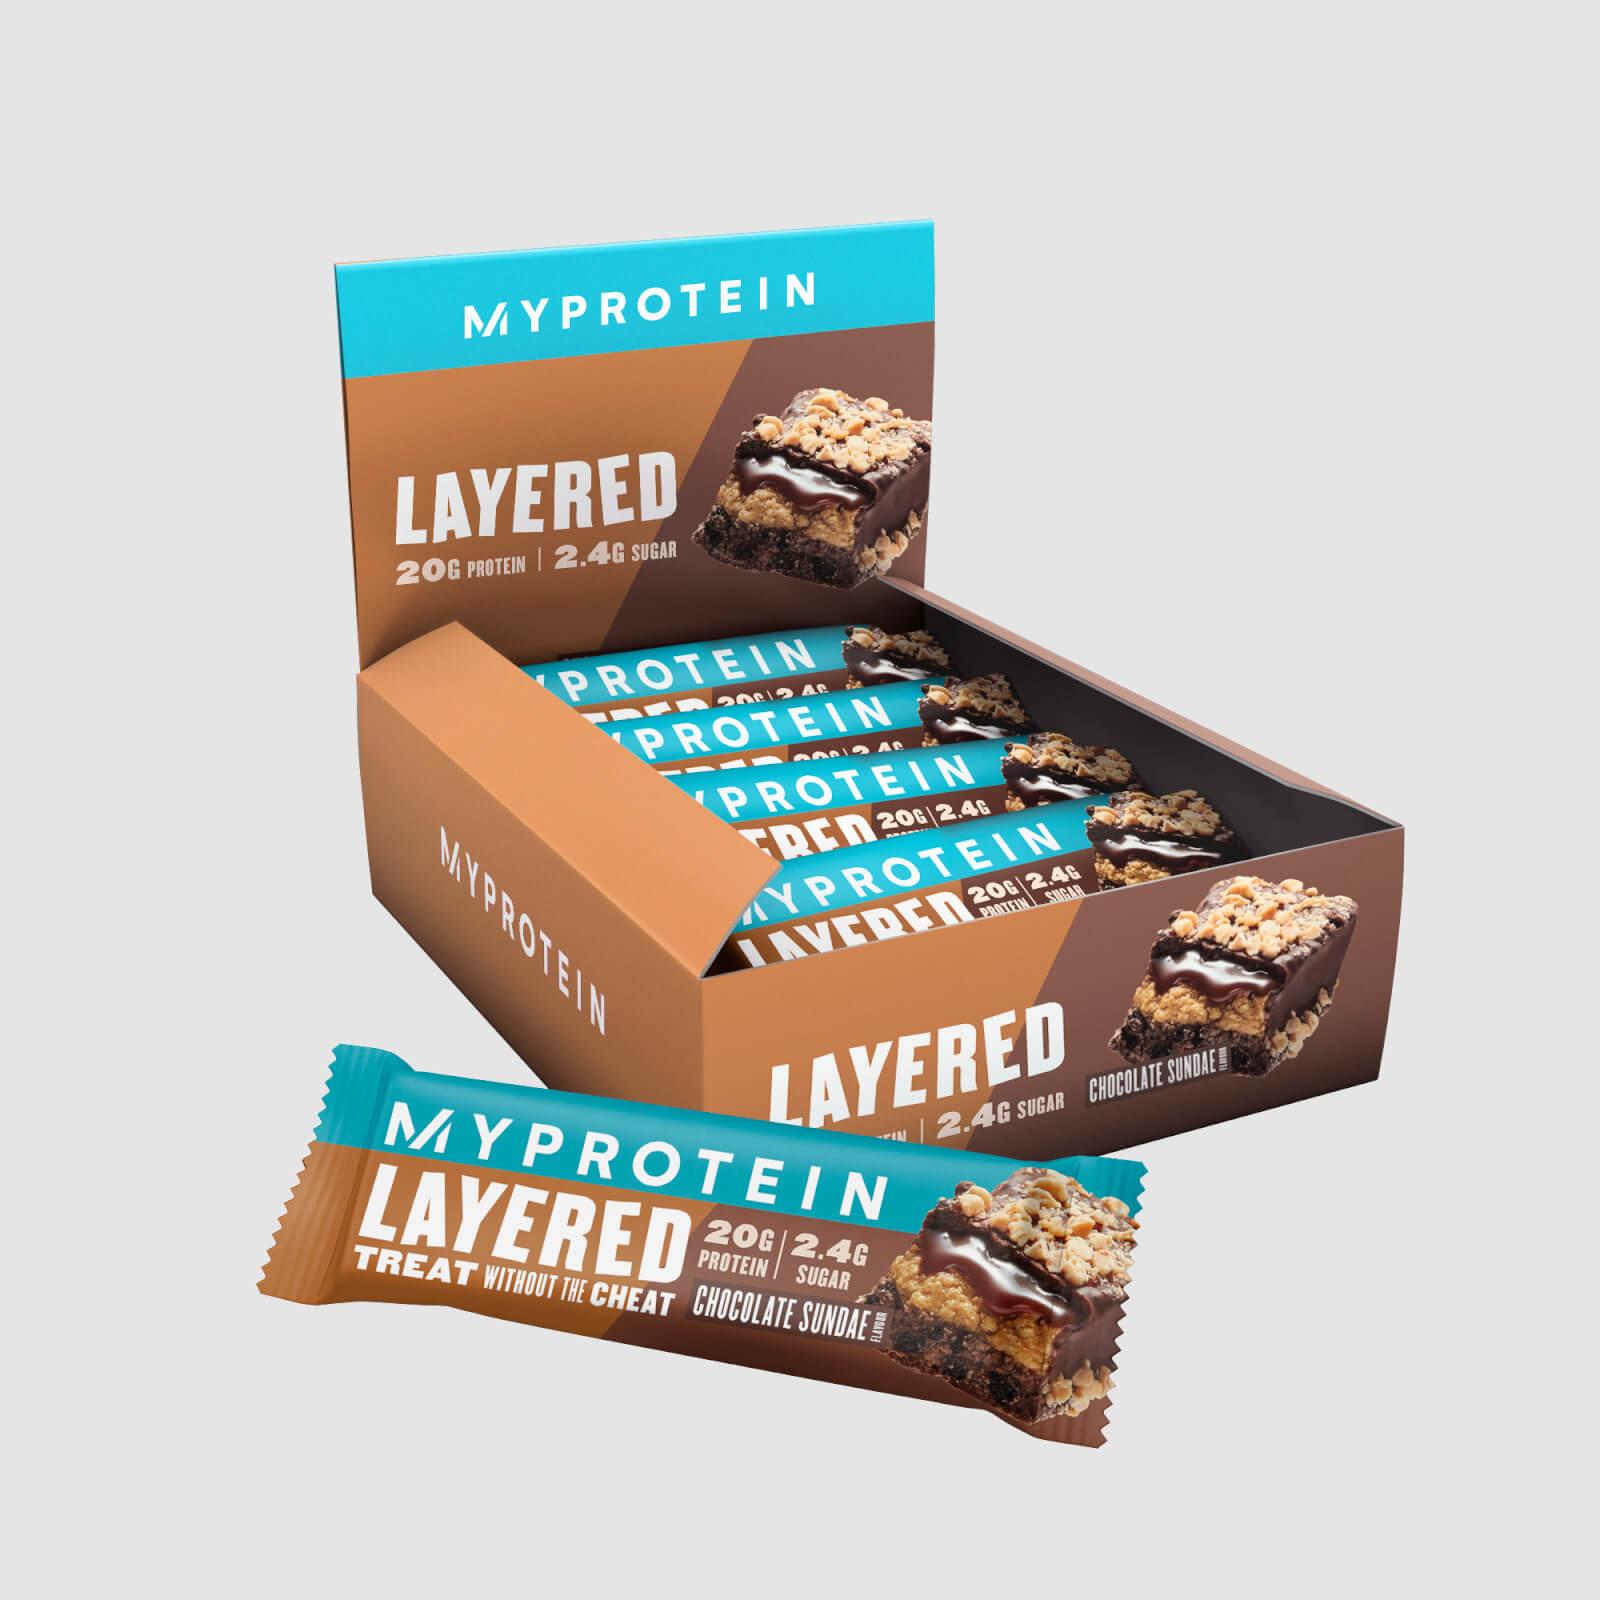 Myprotein Barre de protéines à 6 couches - 12 x 60g - Sundae Chocolat